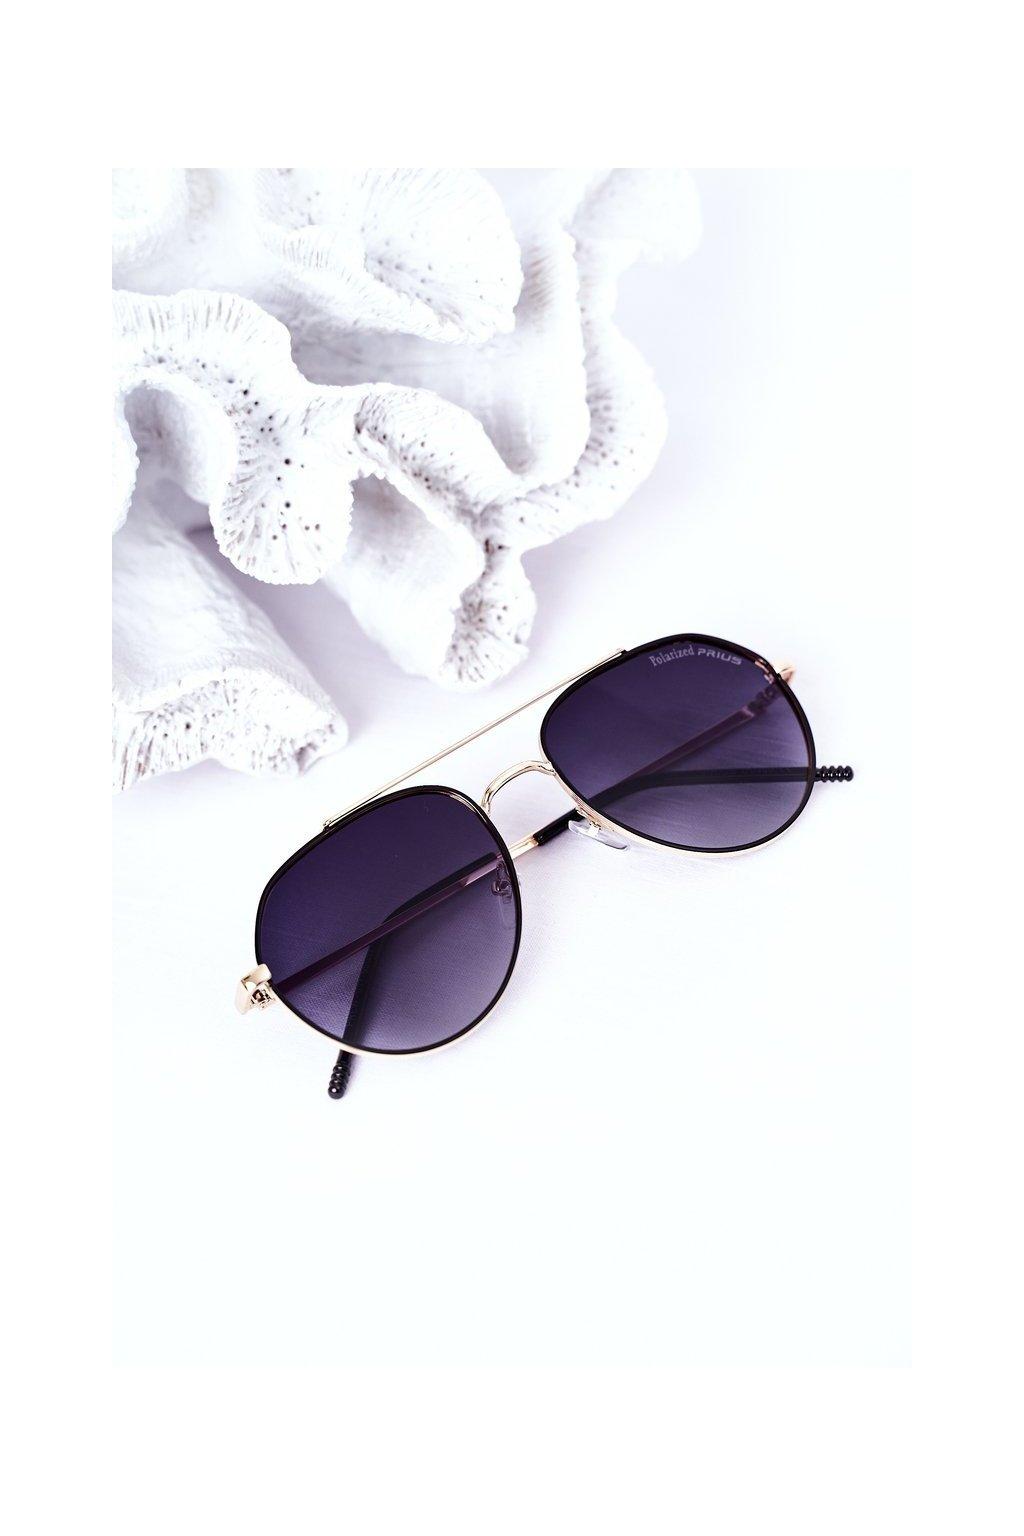 Módne slnečné okuliare čierne Polarized PRIUS PRIUS003 BLACK